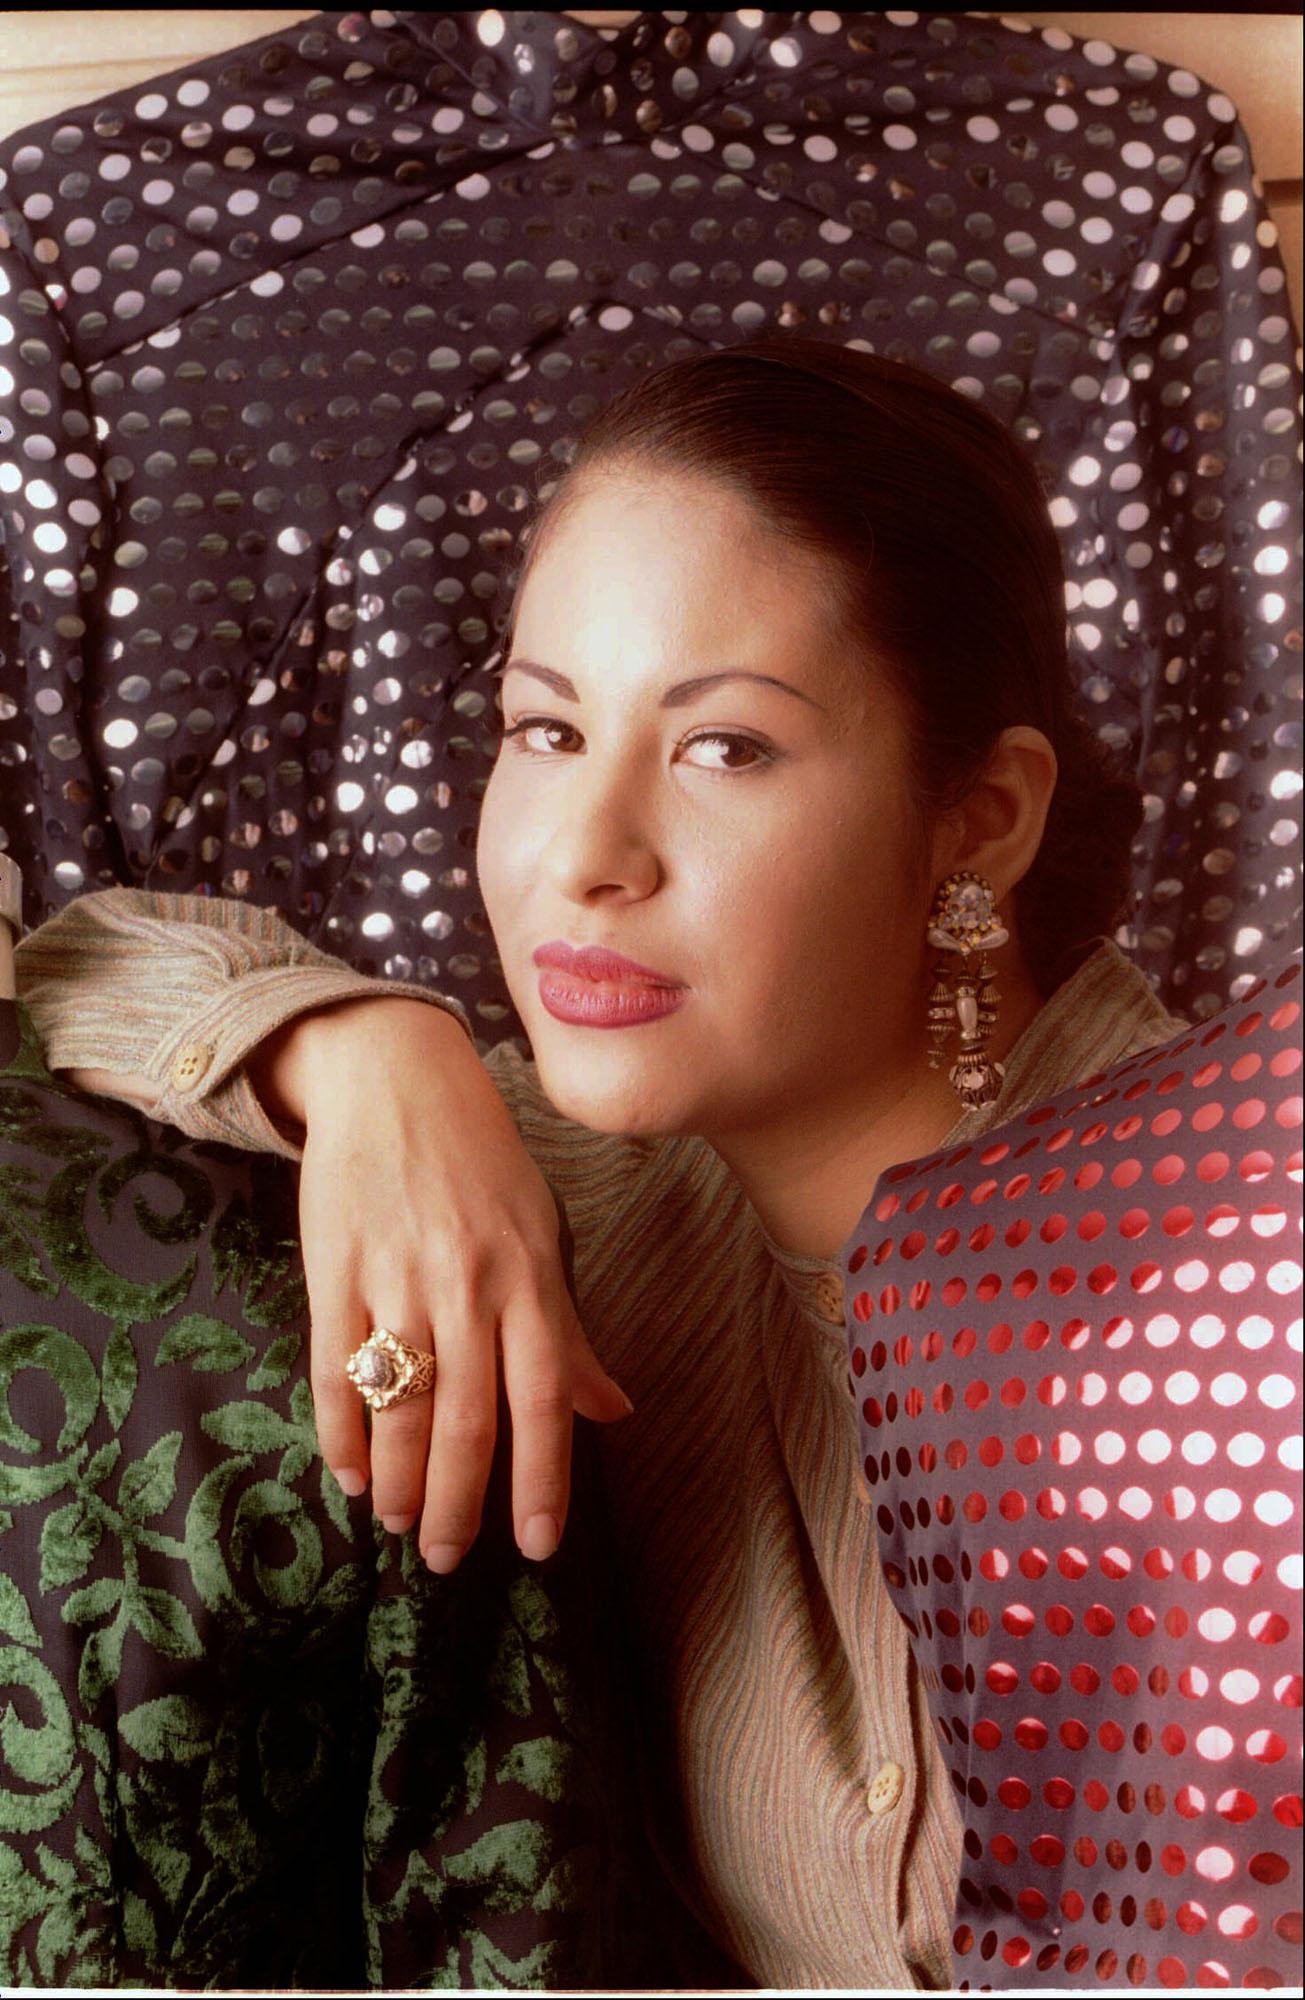 Astonishing Mac Cosmetics Plans Selena Inspired Collection Houston Chronicle Hairstyles For Men Maxibearus